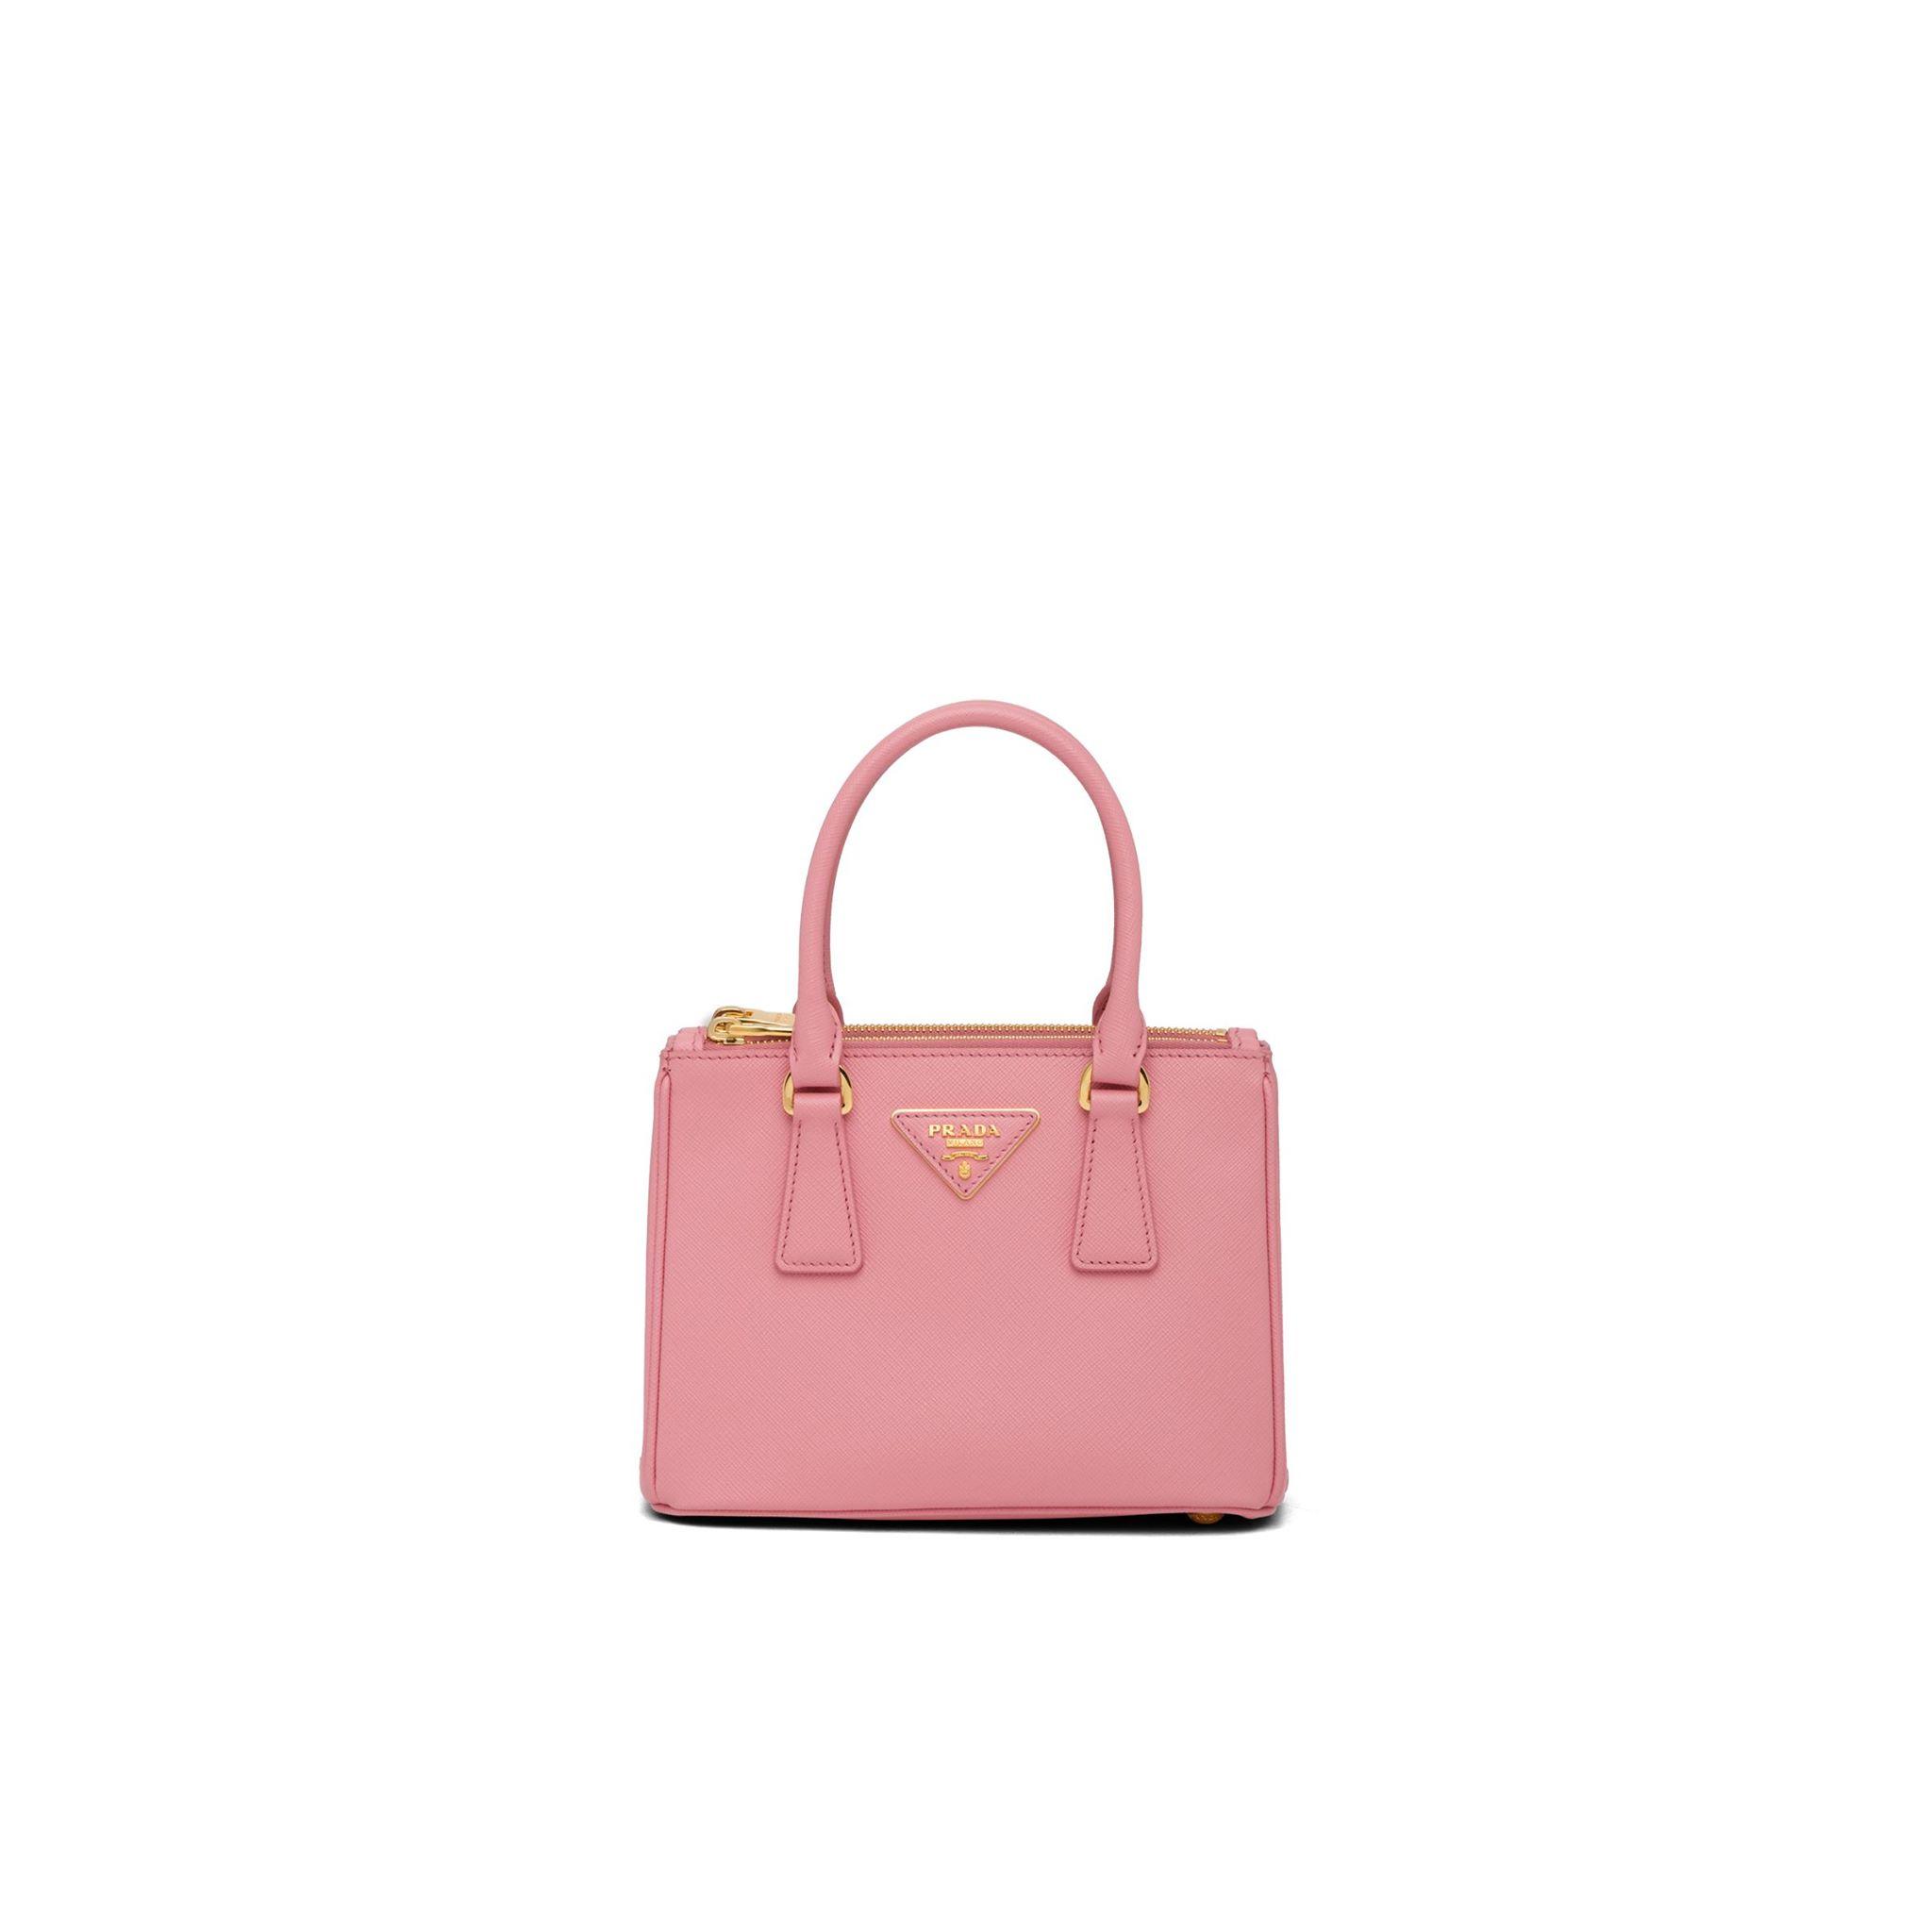 Prada Galleria Saffiano leather micro-bag